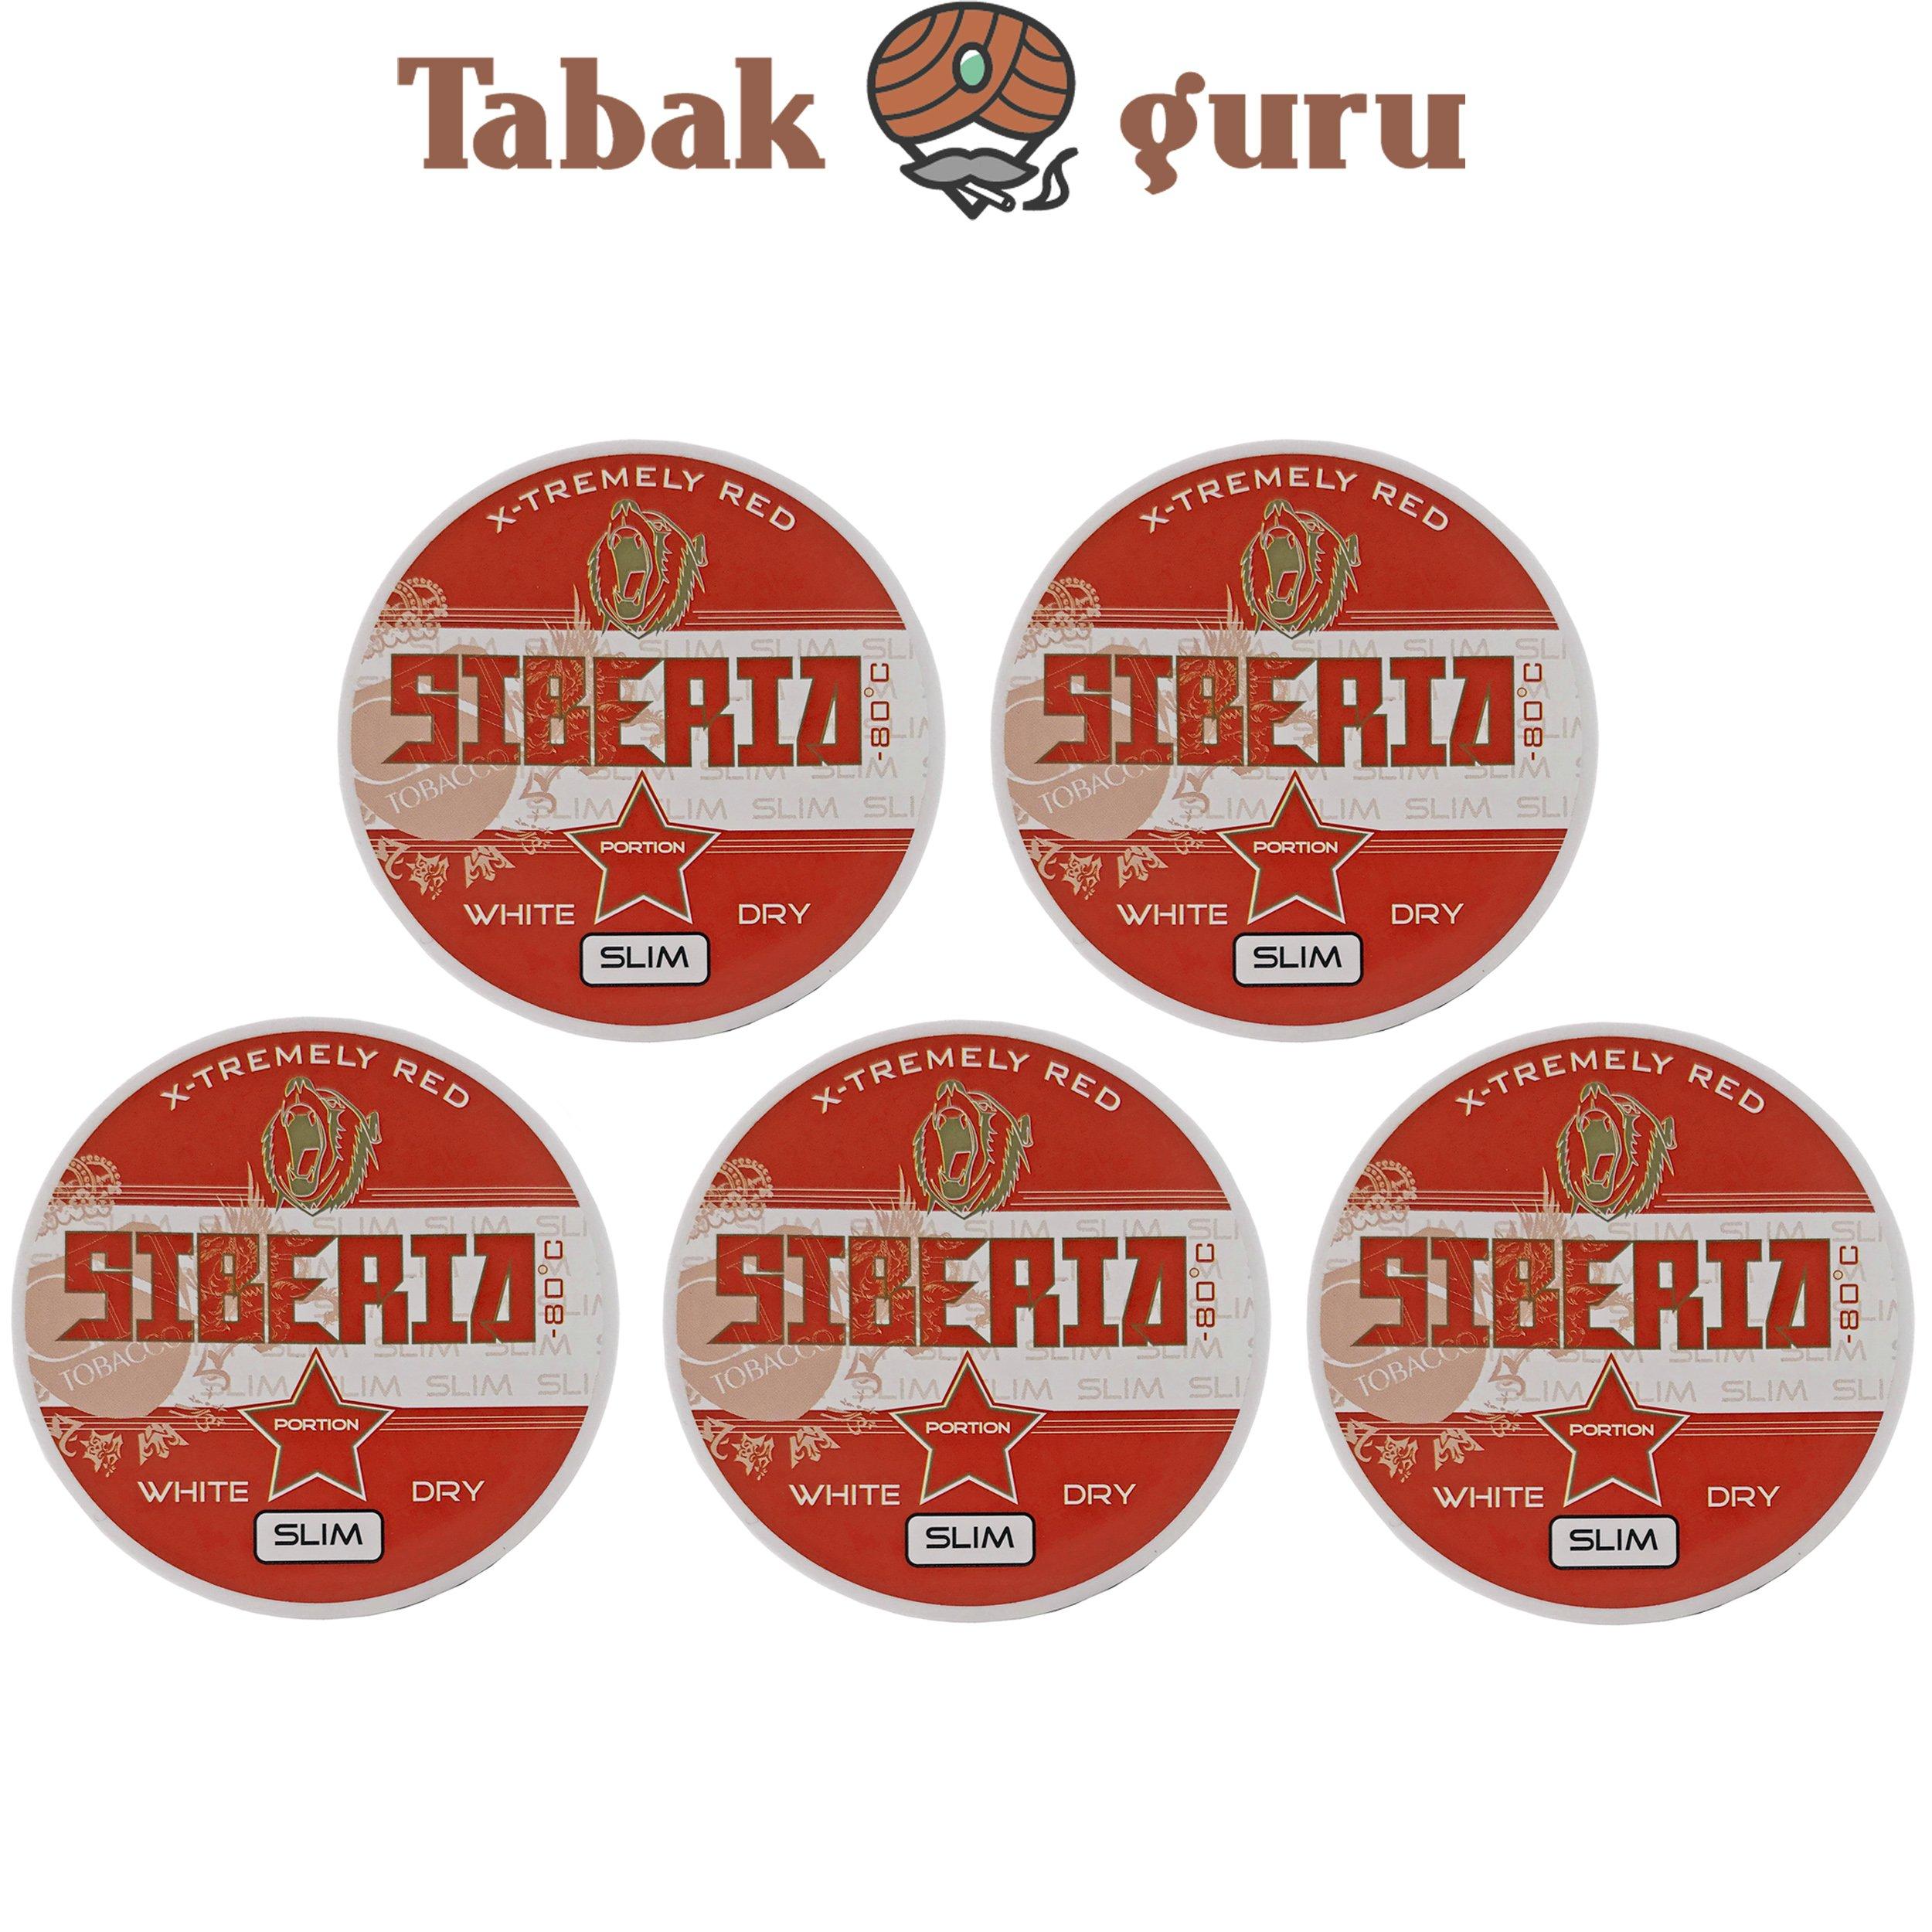 5x Siberia 80° Extremely Red White Dry Slim Kautabak Dose